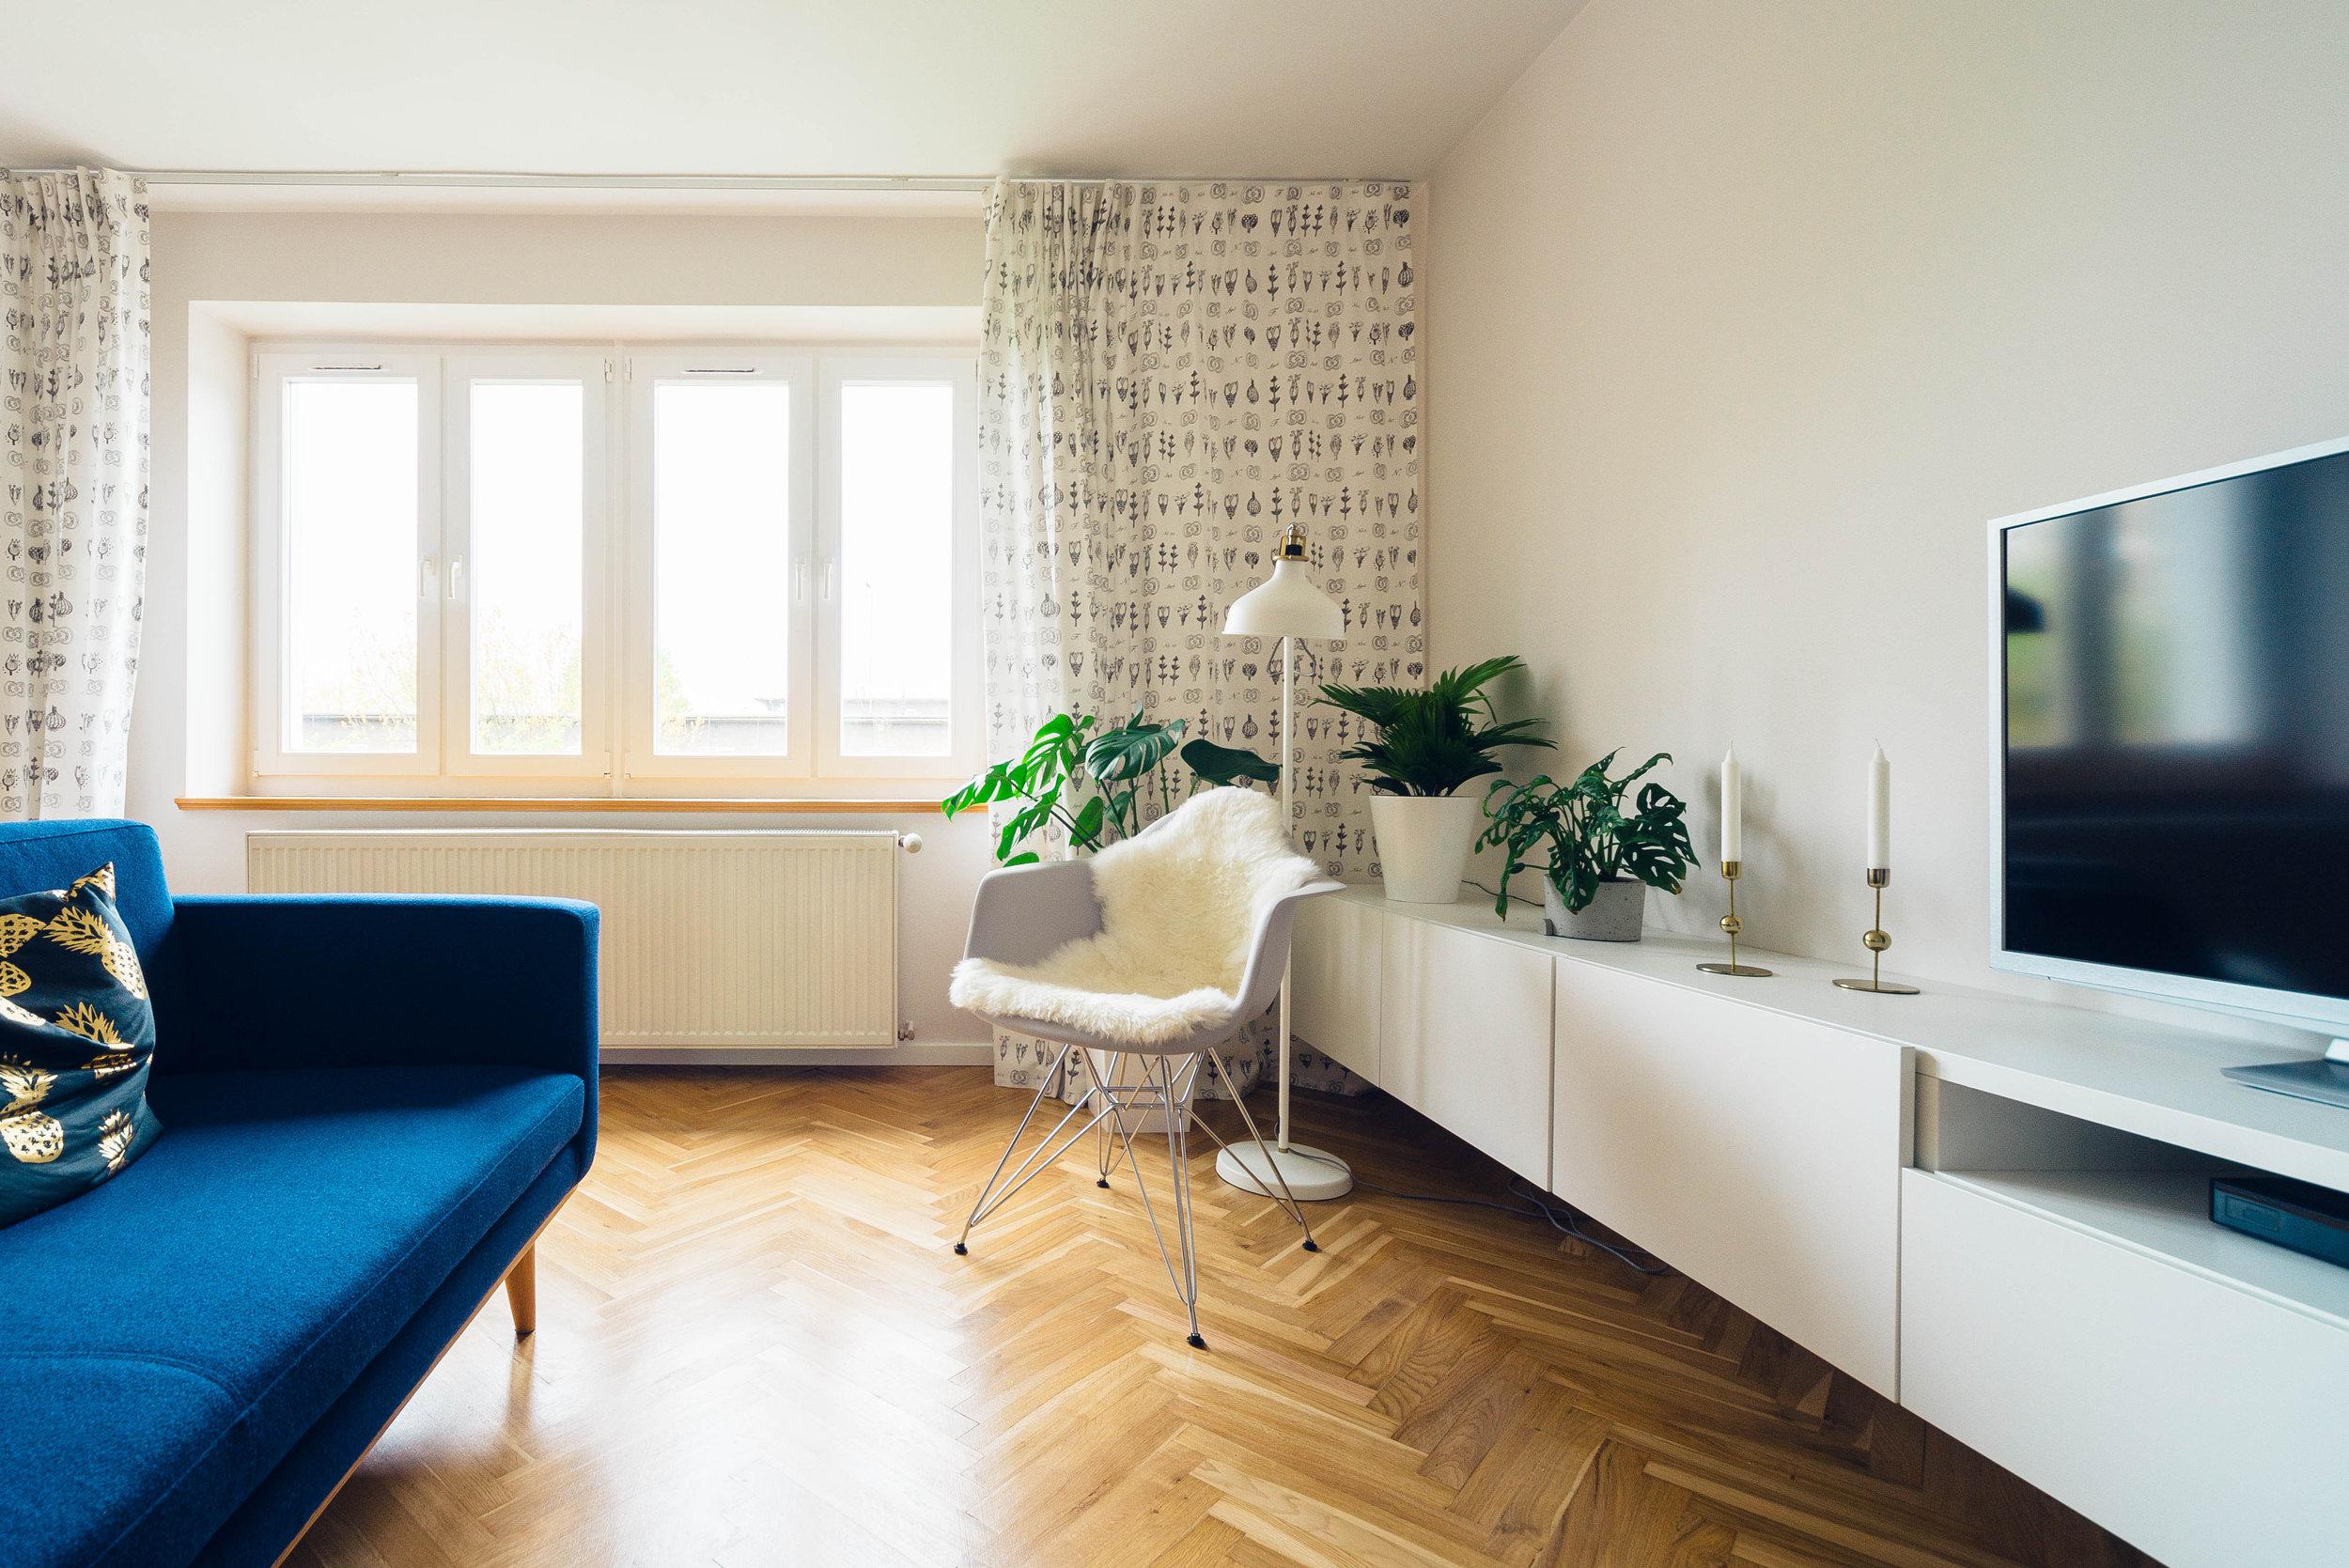 Get A Free Home Evaluation